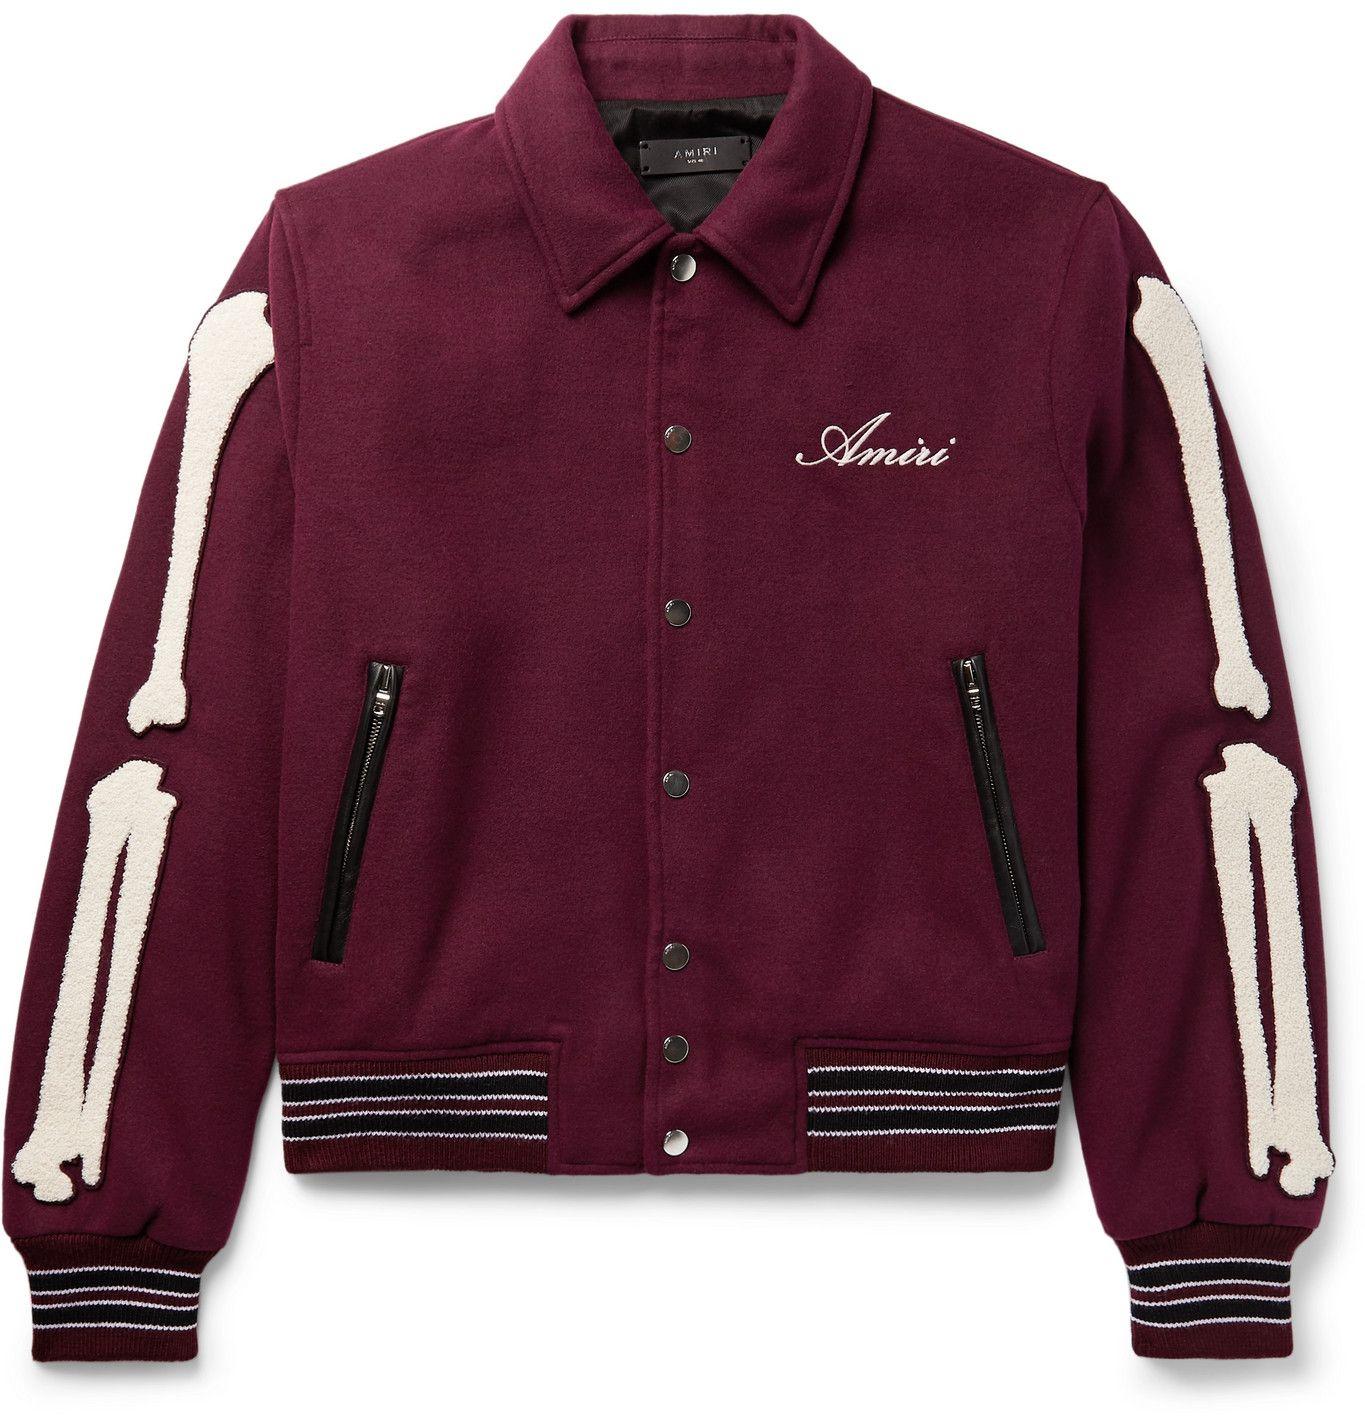 Logo Embroidered Appliqued Fleece Bomber Jacket Bomber Jacket Varsity Jacket Men Logo Embroidered [ 1426 x 1365 Pixel ]